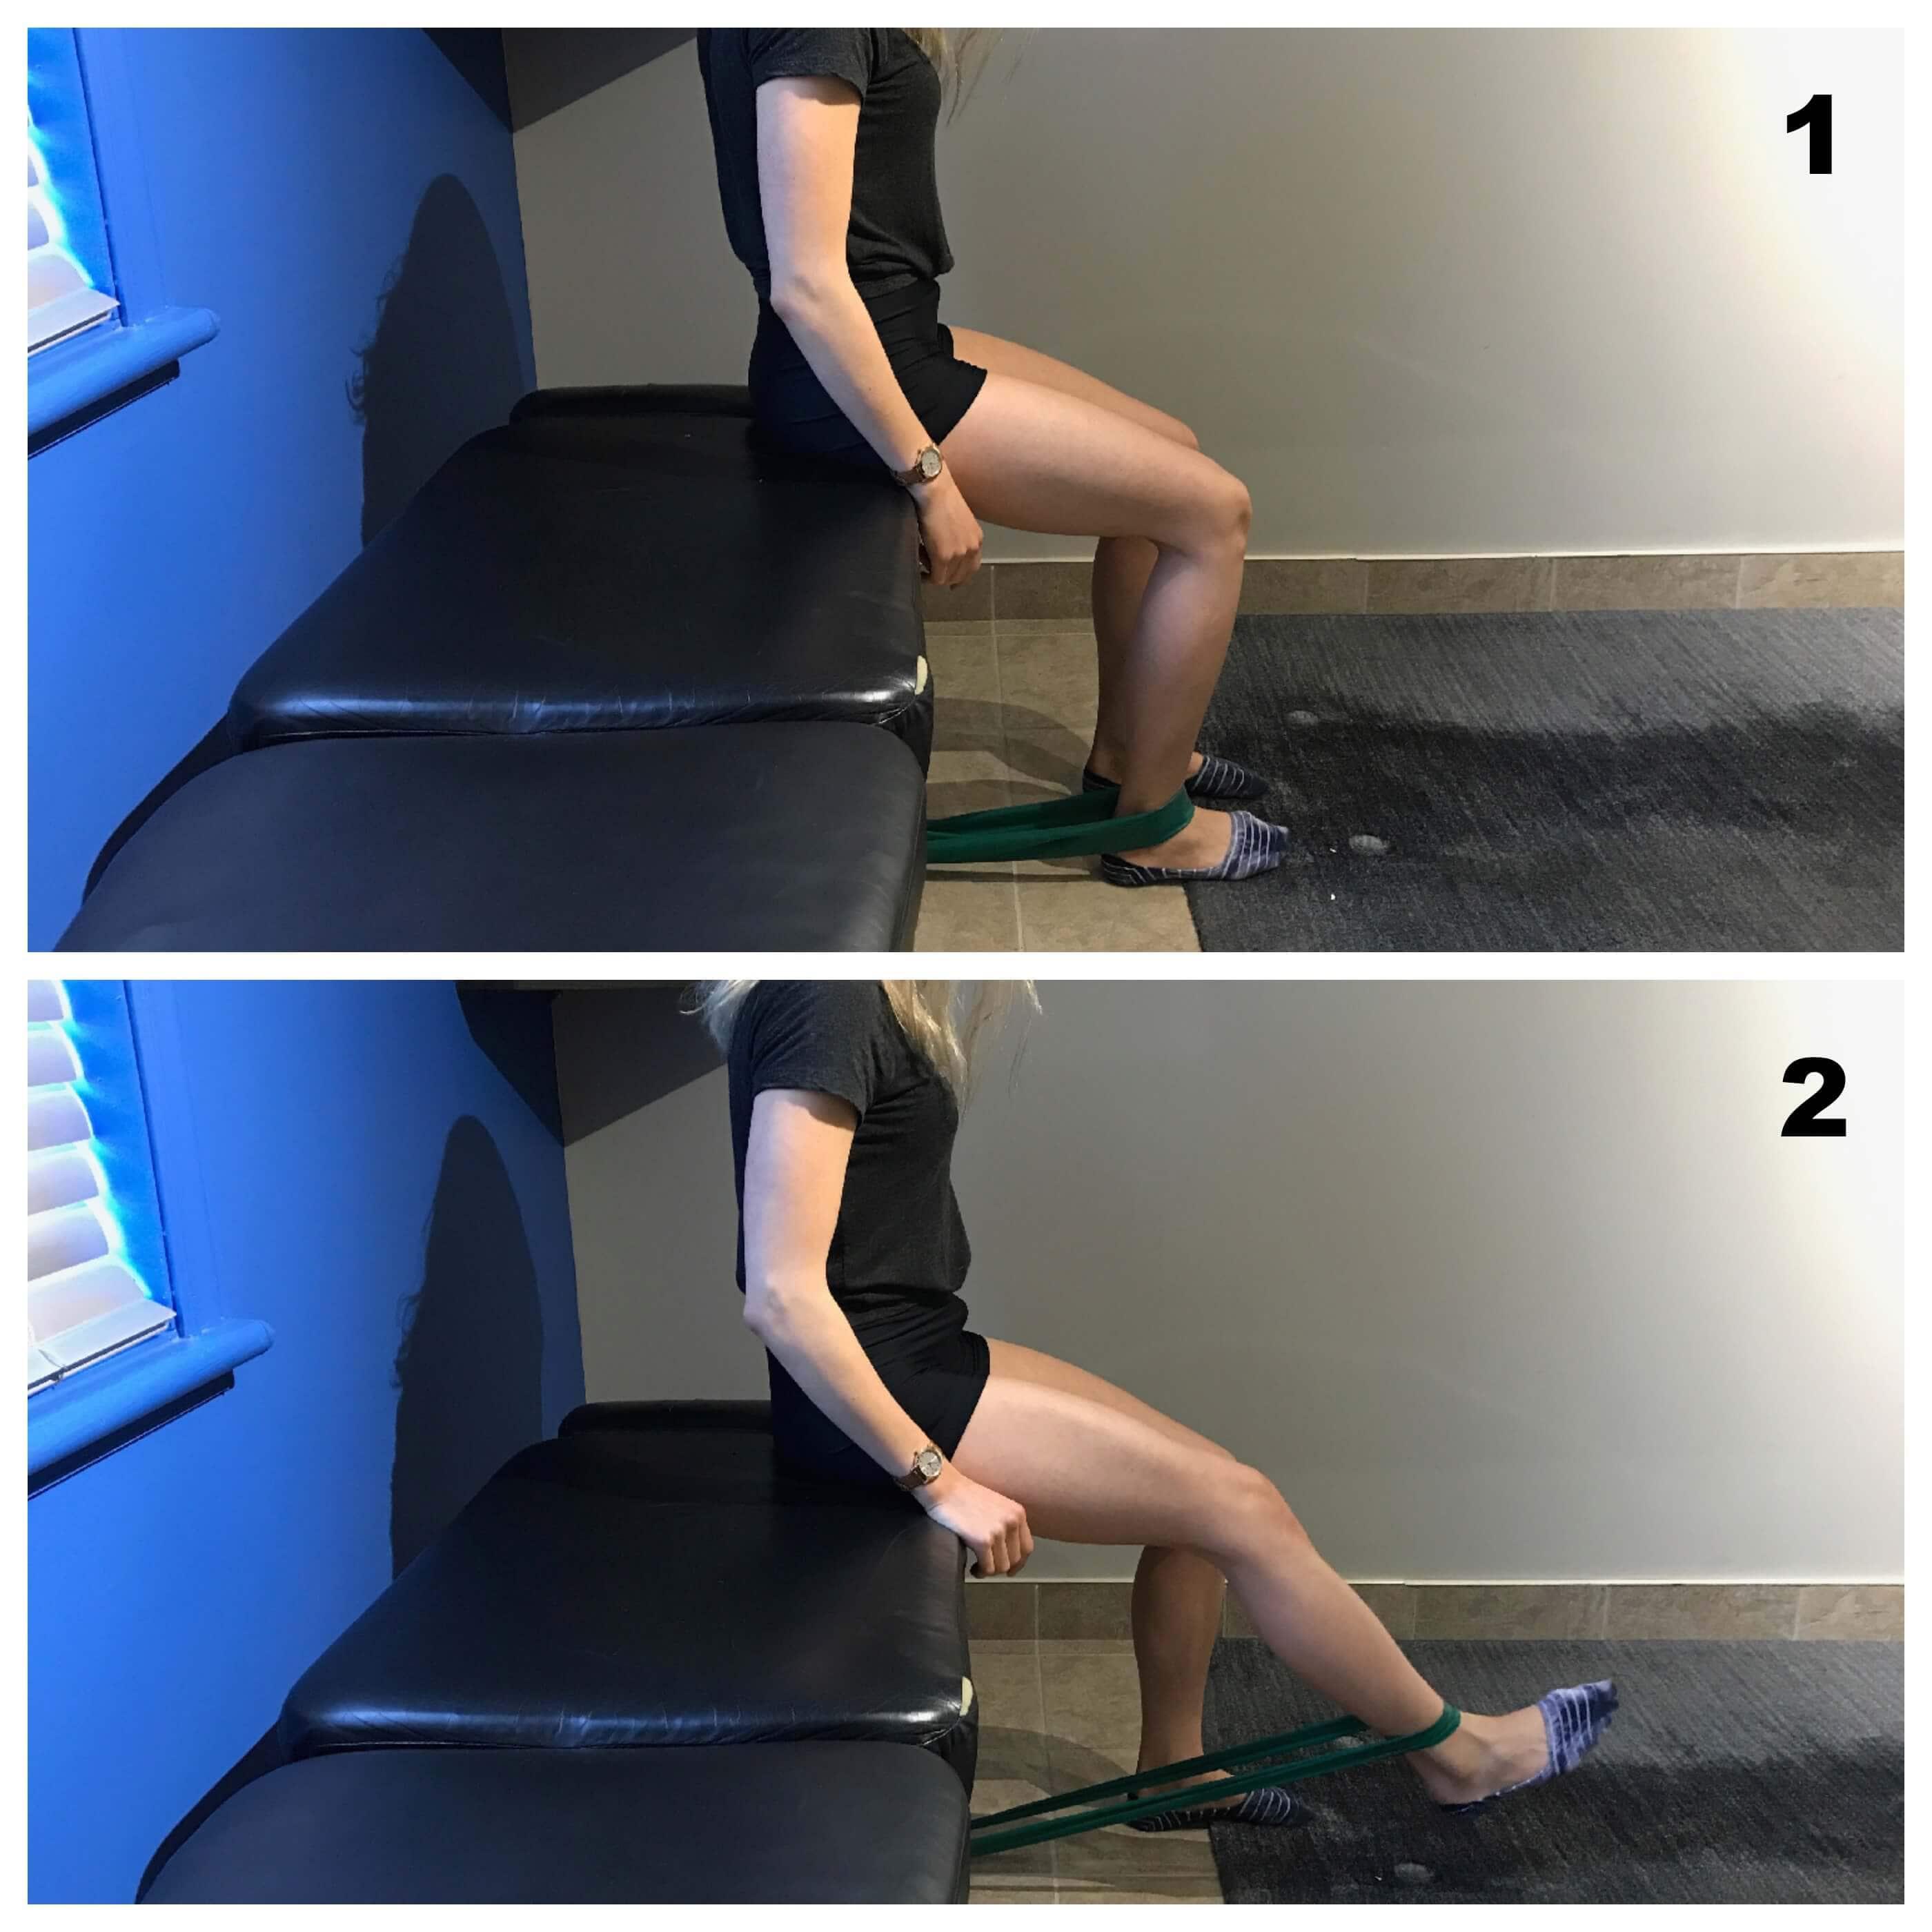 Force quadriceps avec elastique pour syndrome femoro patellaire